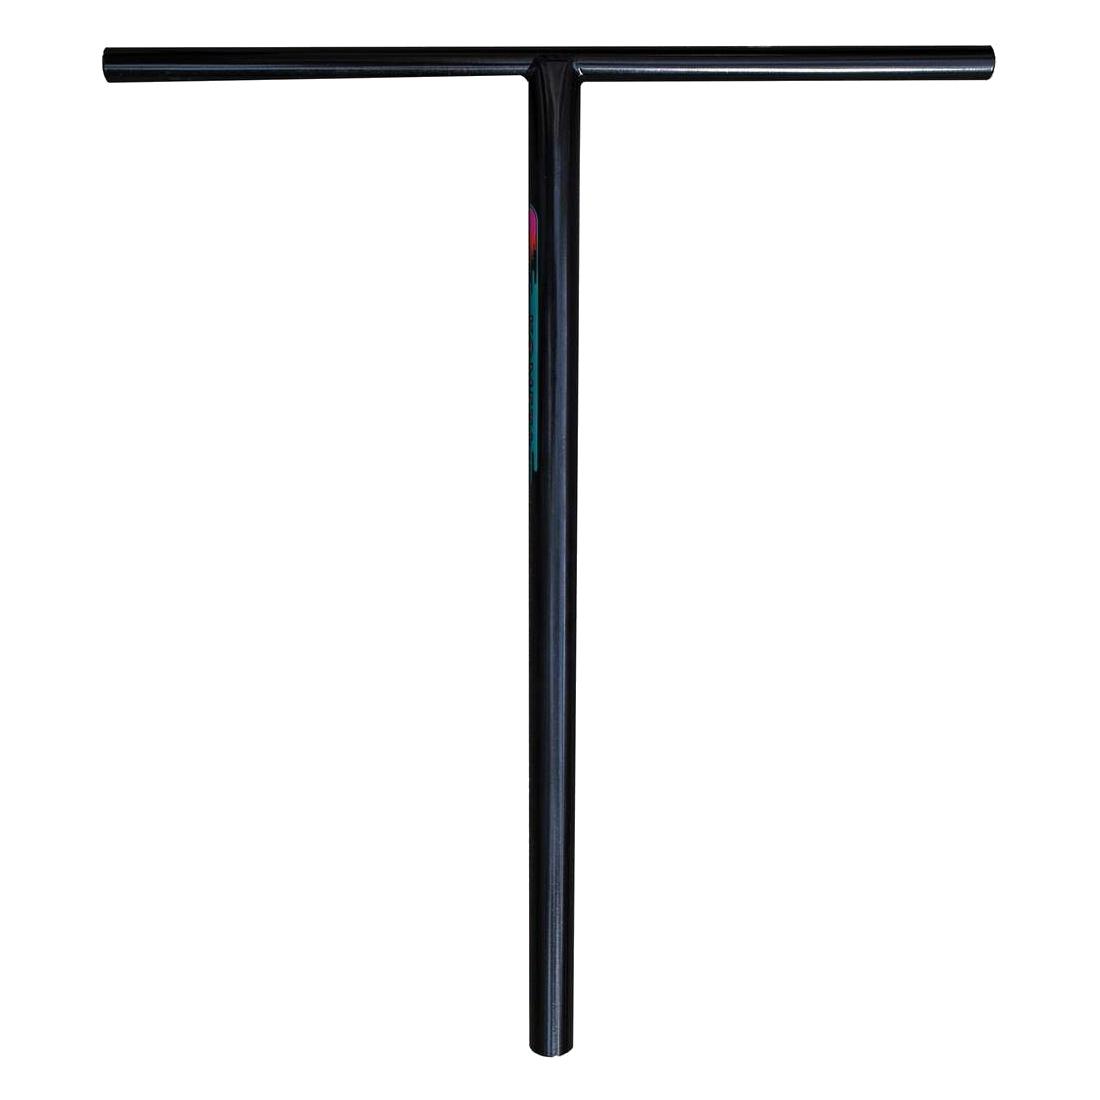 Руль для трюкового самоката КОМЕТА V2 Oversized 34.9 (Darkside Black)